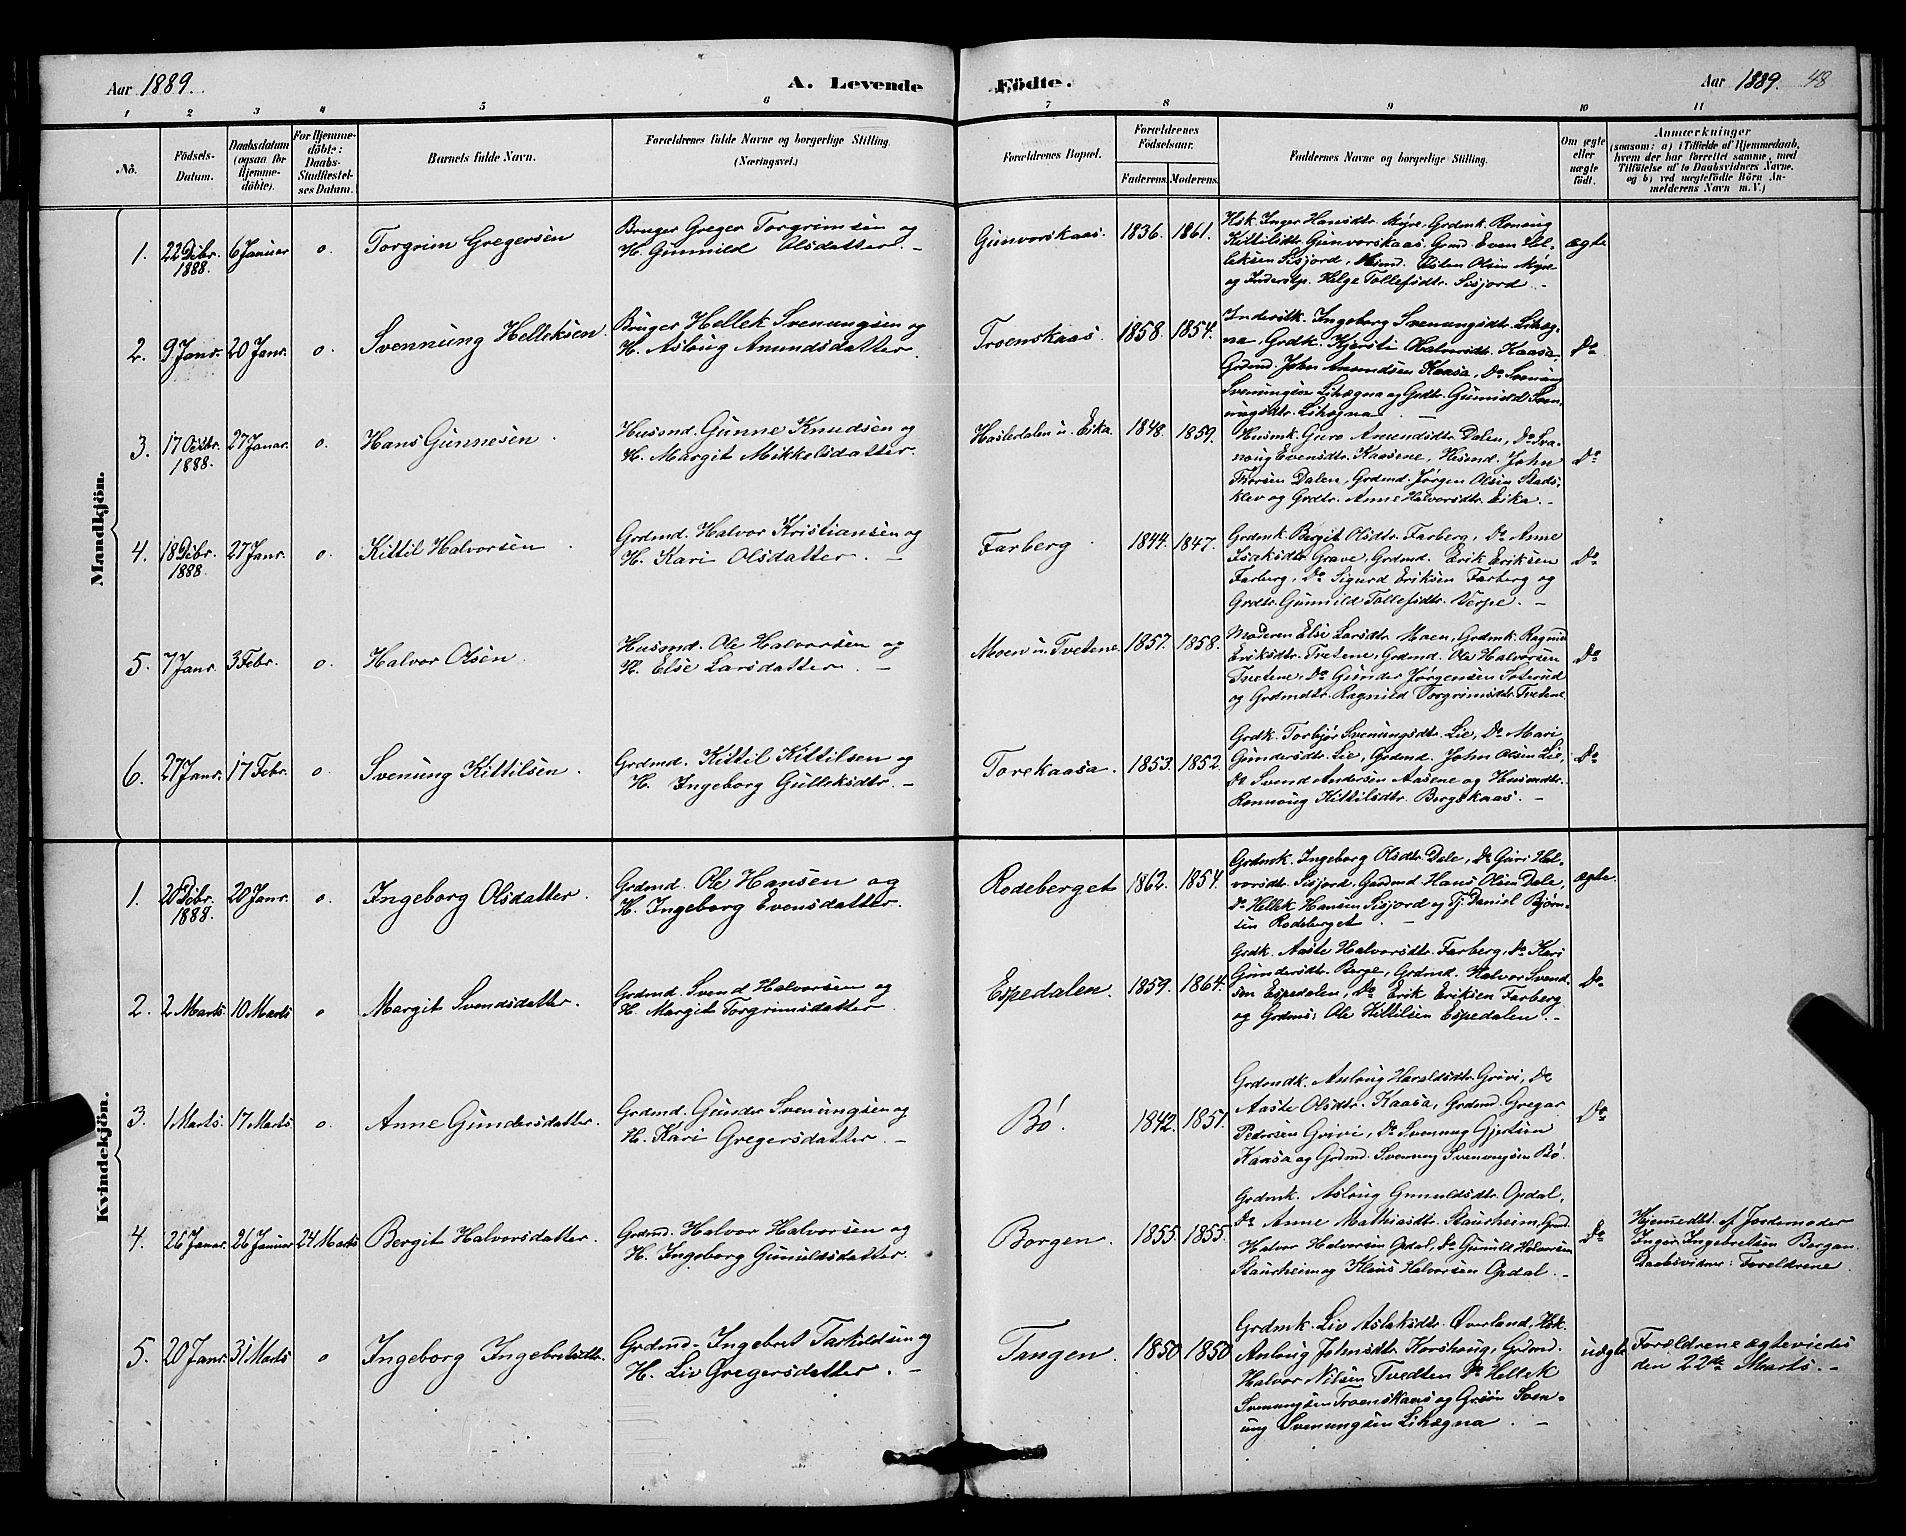 SAKO, Bø kirkebøker, G/Ga/L0005: Klokkerbok nr. 5, 1883-1897, s. 48